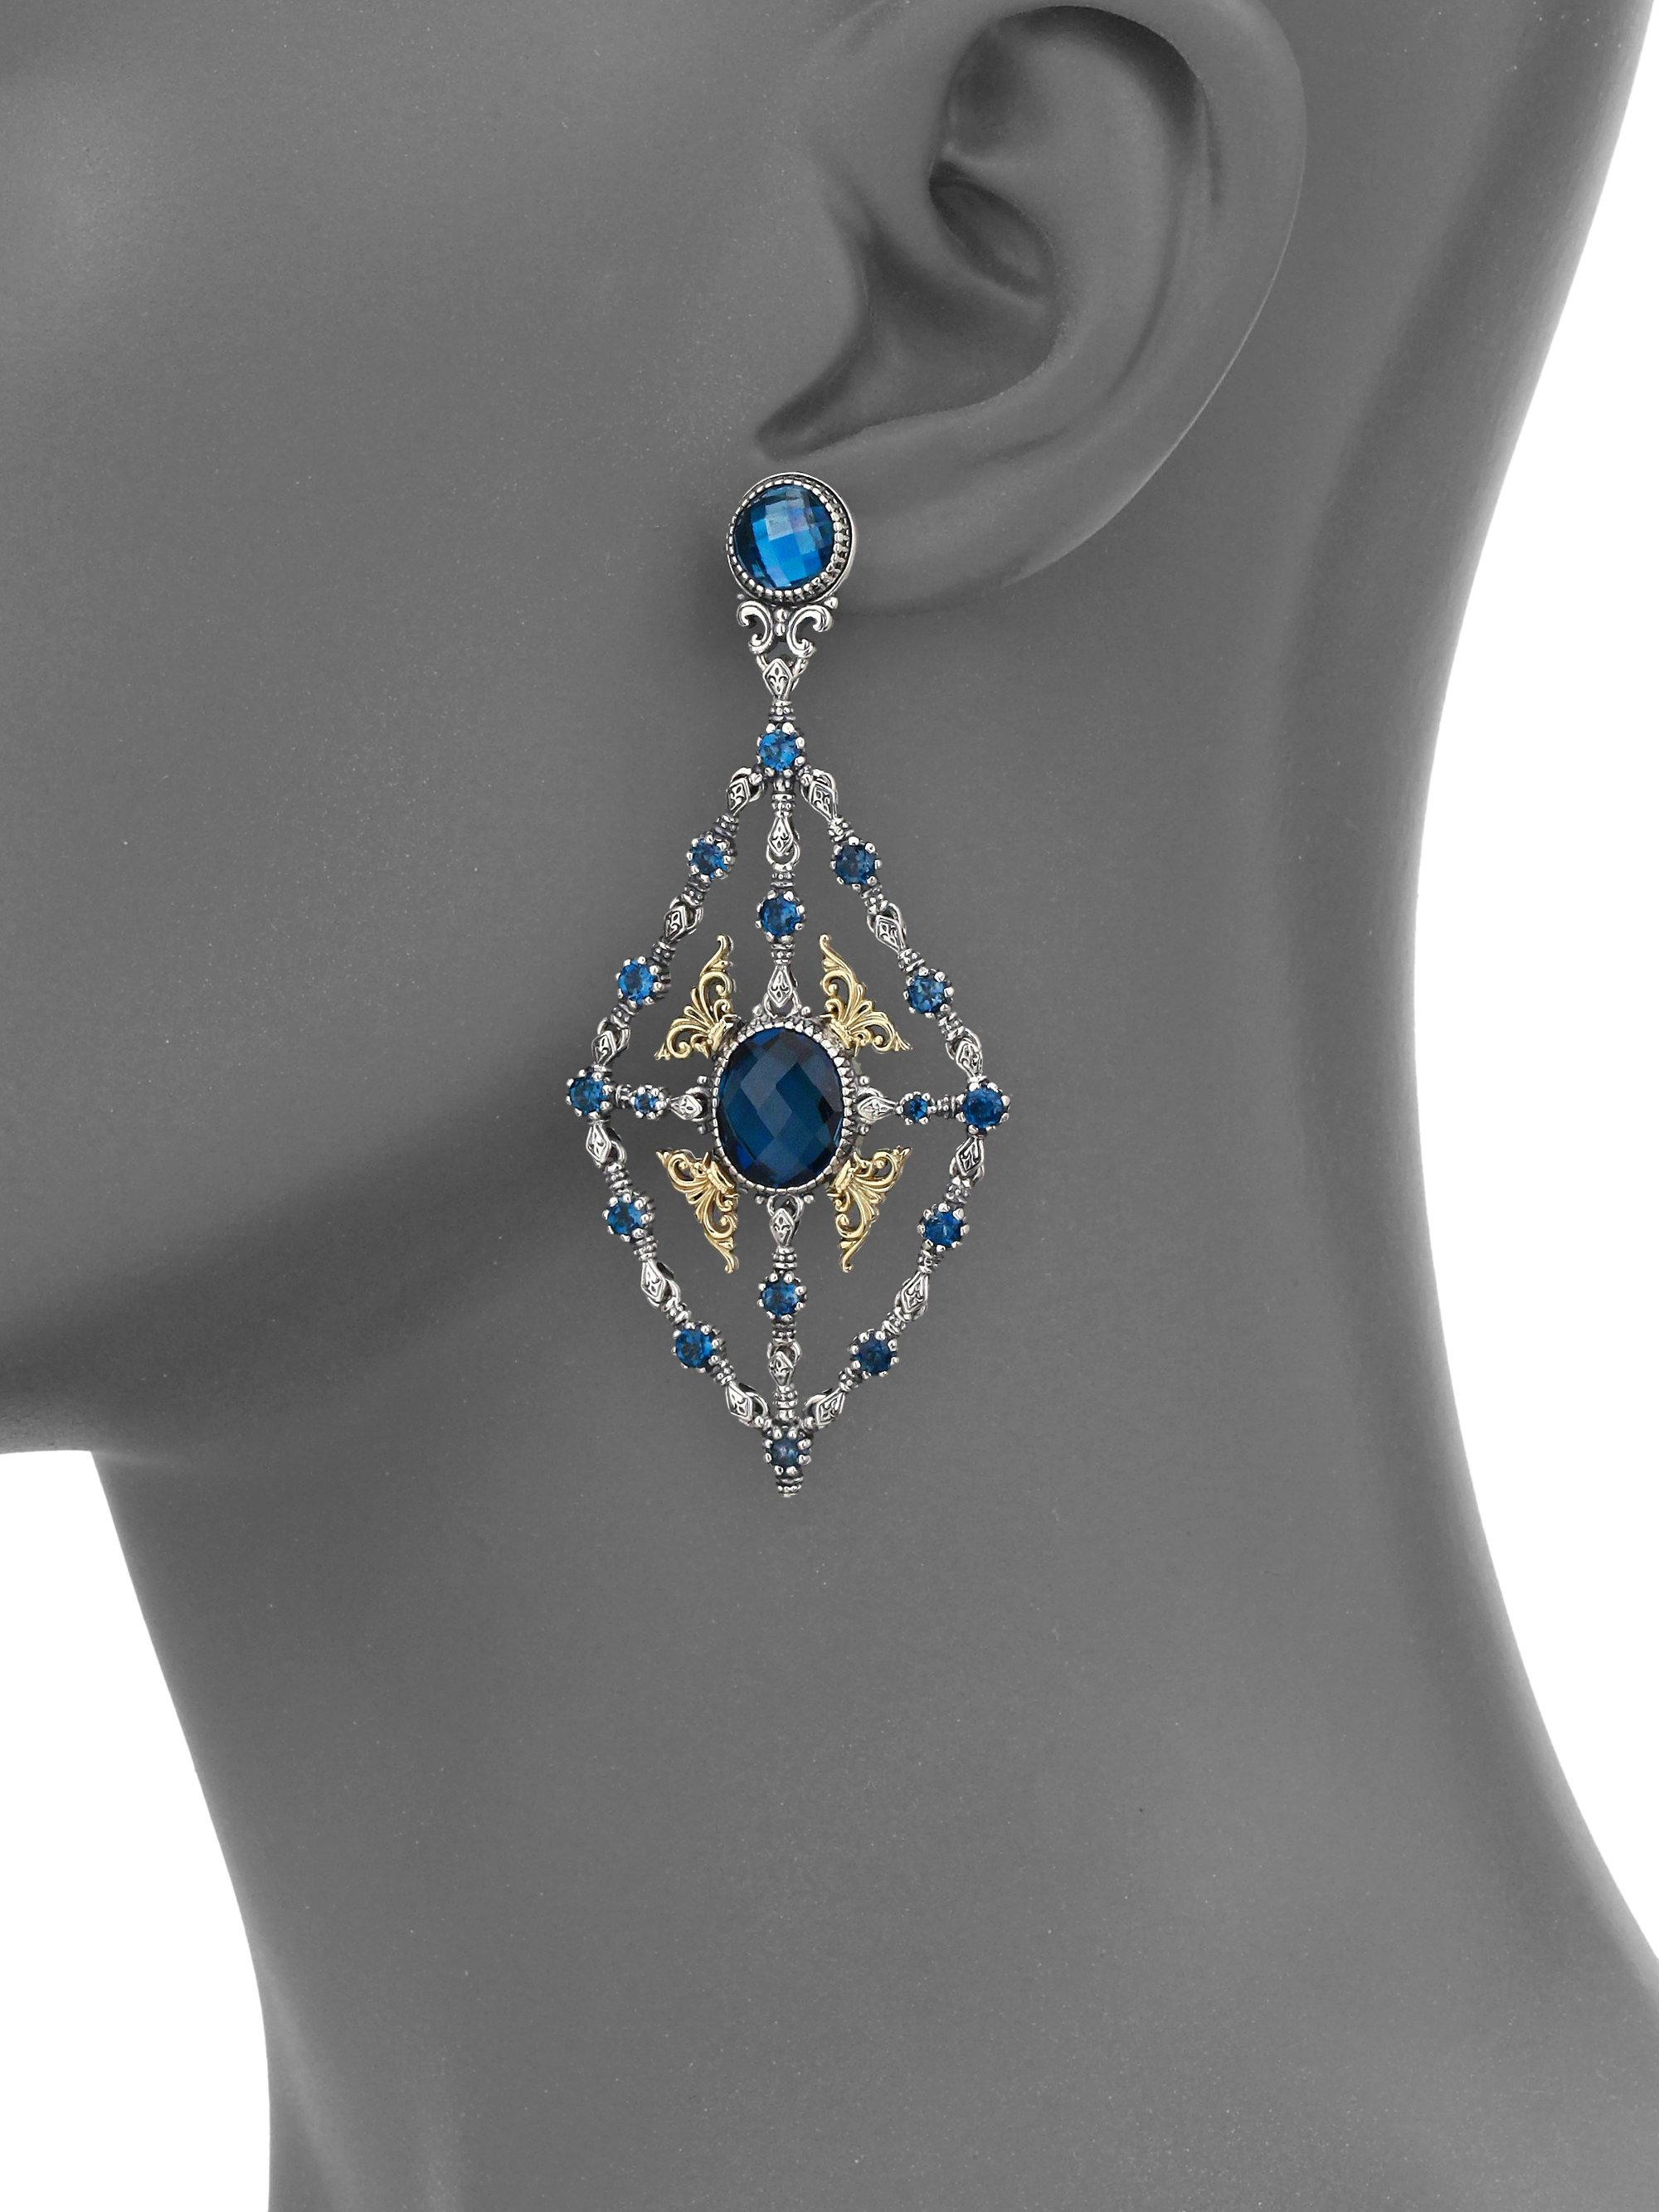 Lyst konstantino thalassa london blue topaz 18k yellow gold chandelier earrings view fullscreen mozeypictures Gallery